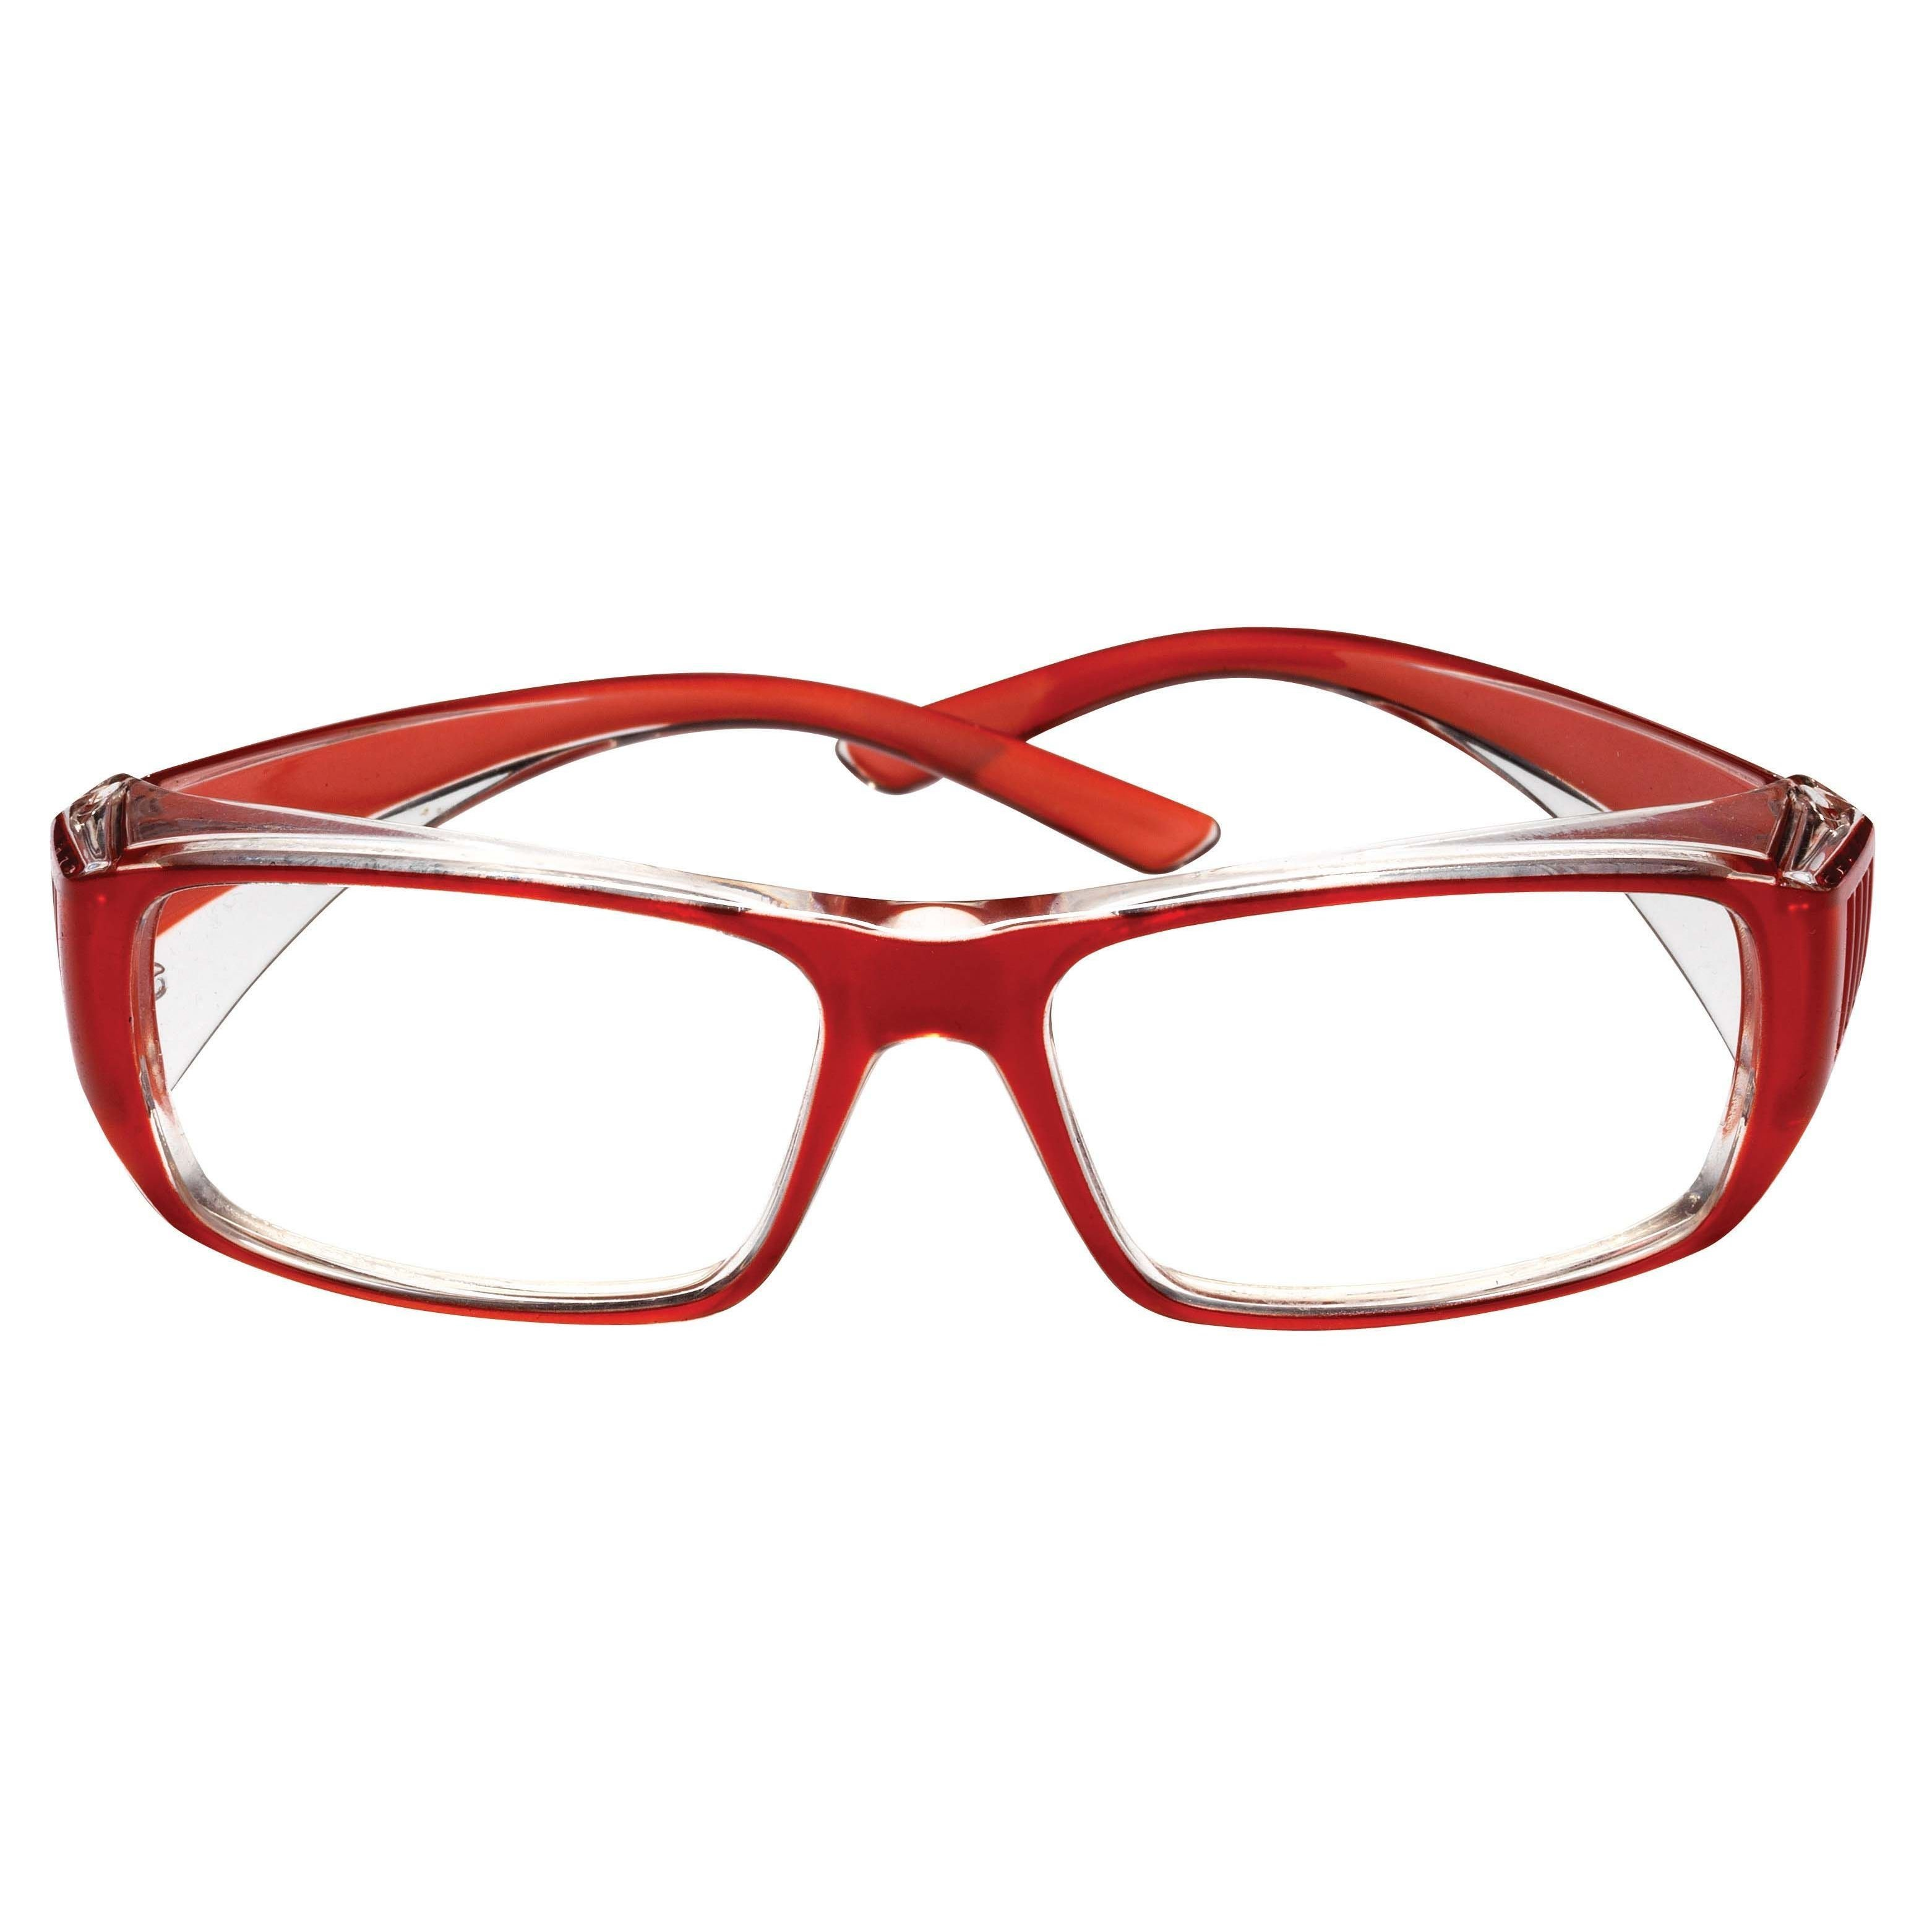 2a48a6f2218b6 Buy Bolle B808 Prescription Safety Glasses - RX Safety